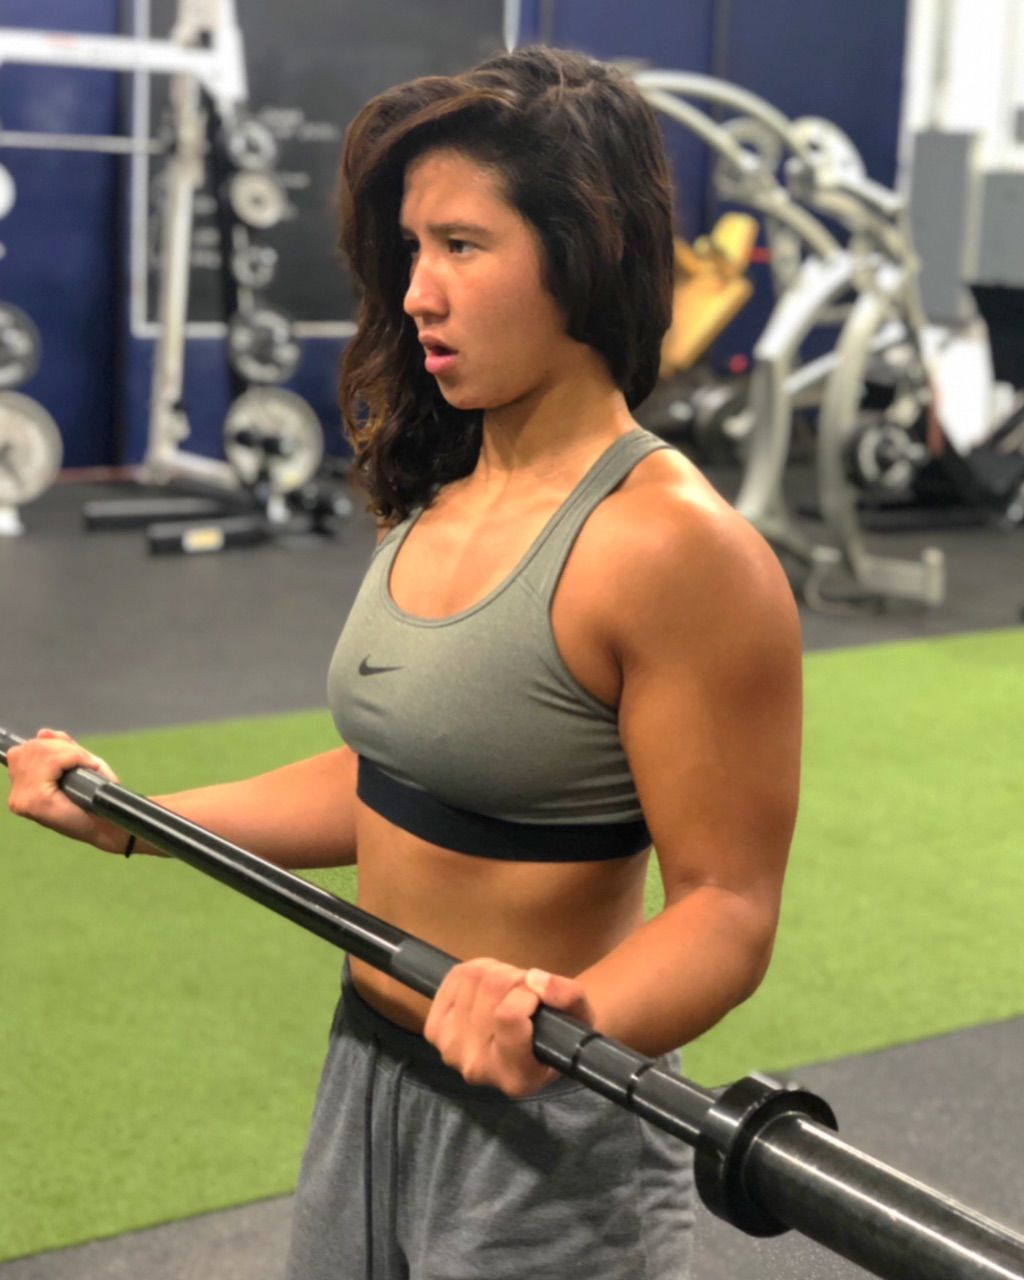 Personal Training - Mesa 2020